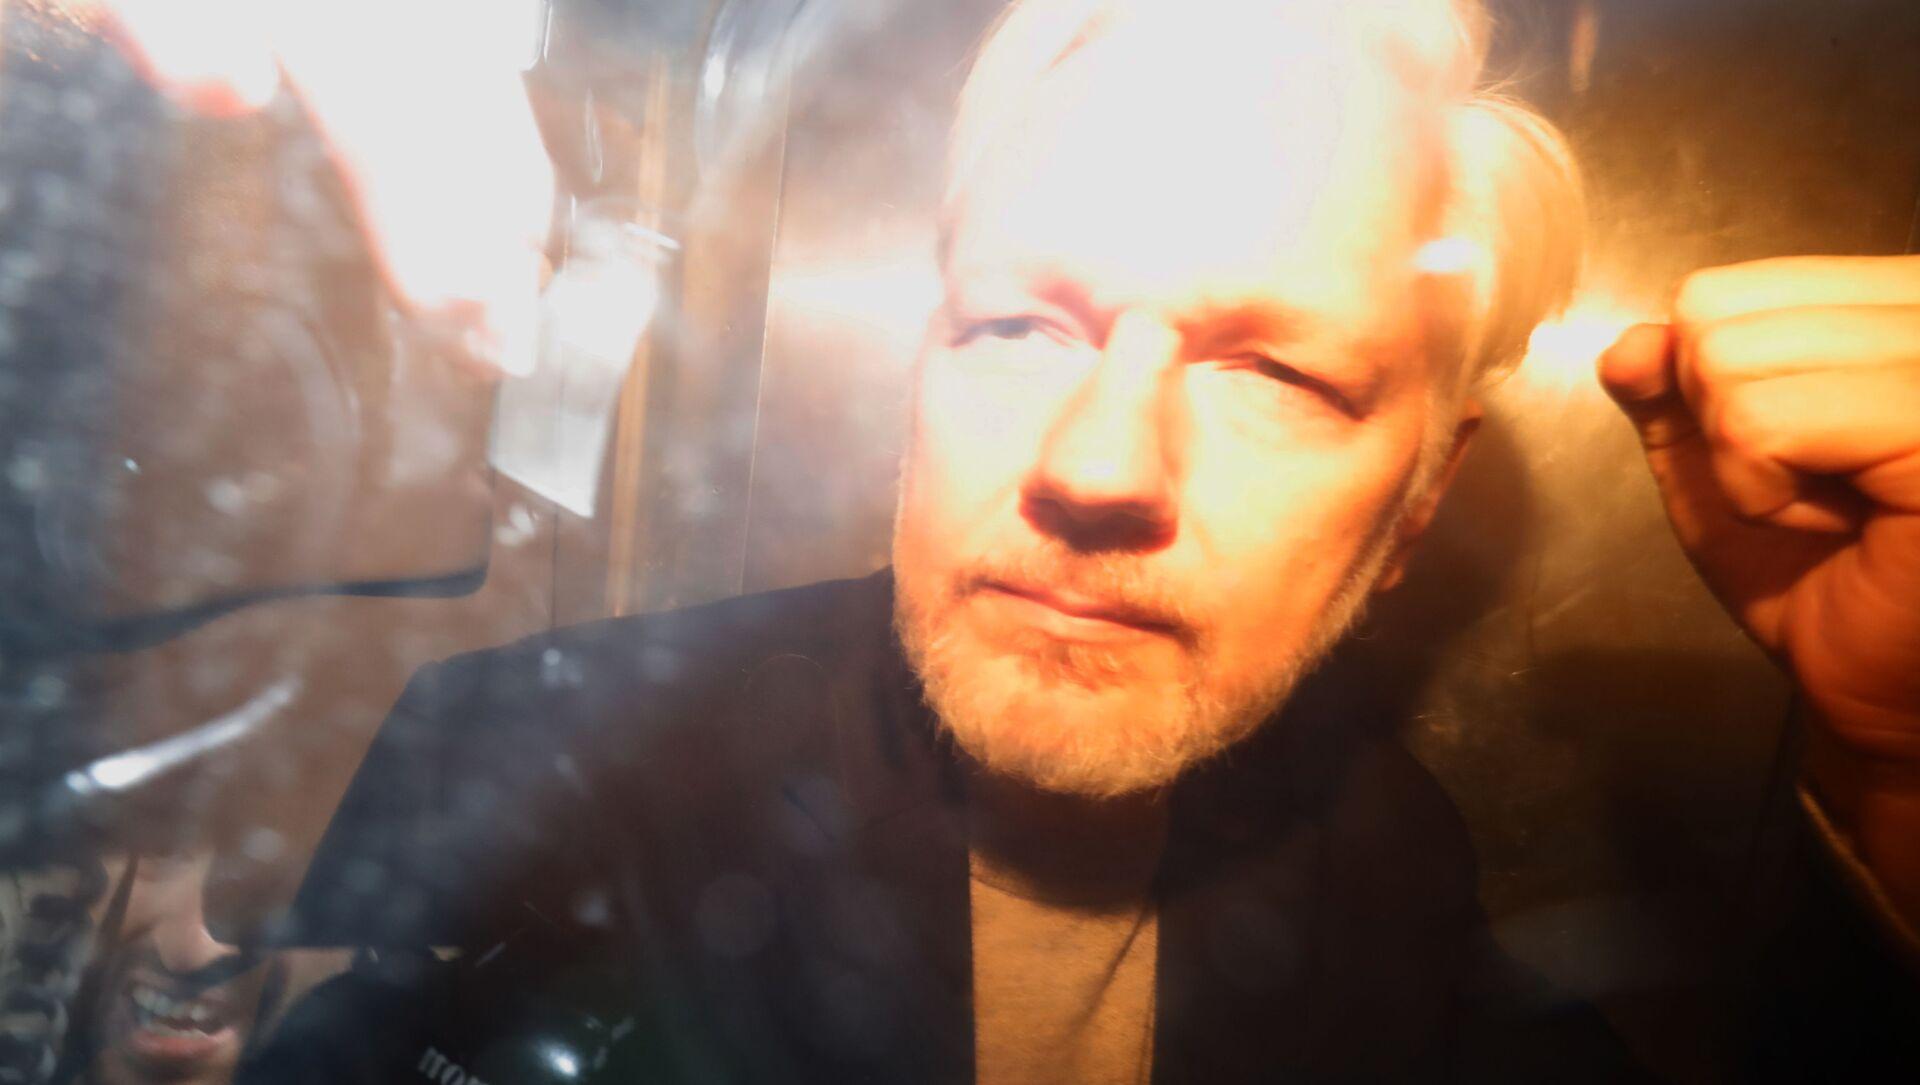 WikiLeaks founder Julian Assange arrives at court in London on May 1, 2019 to be sentenced for bail violation - Sputnik International, 1920, 27.07.2021